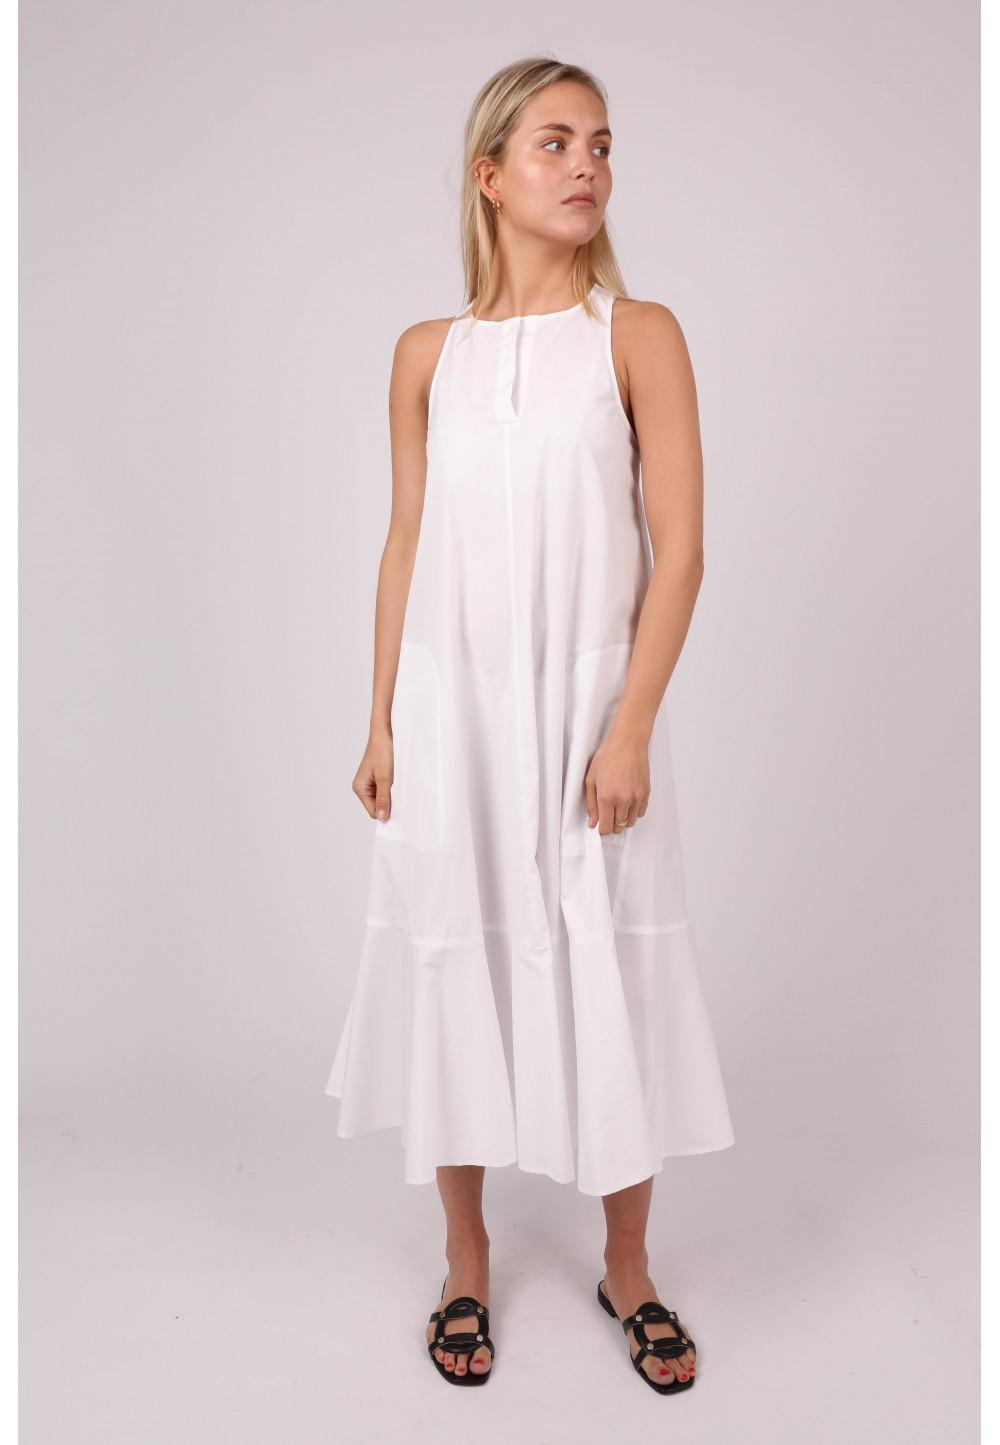 Білосніжна жіночня сукня ABIGALE з воланом